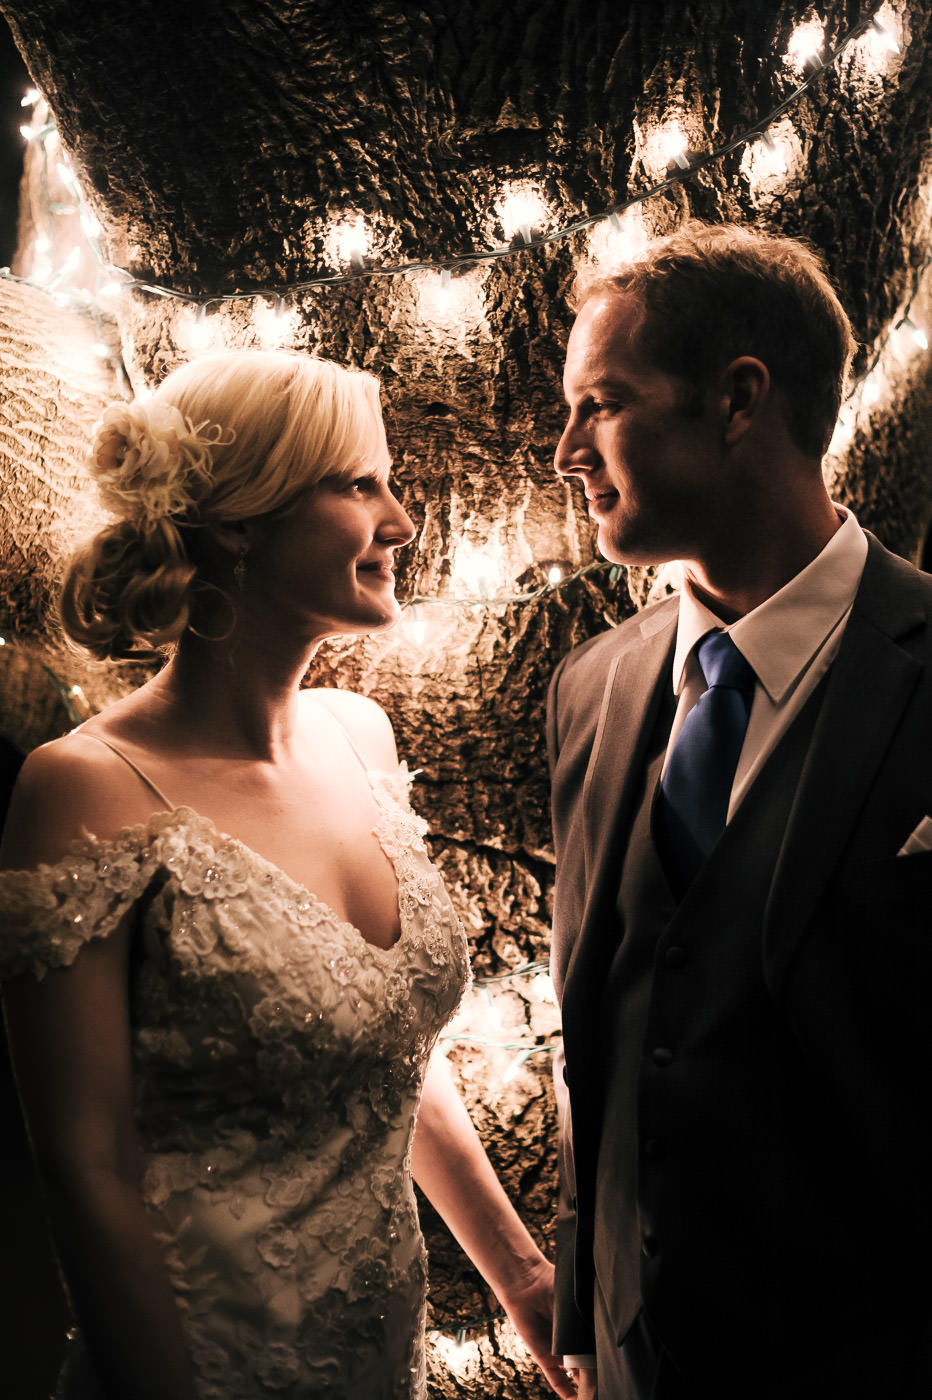 wedding photographer captures romantic moment between bride and groom in temecula california